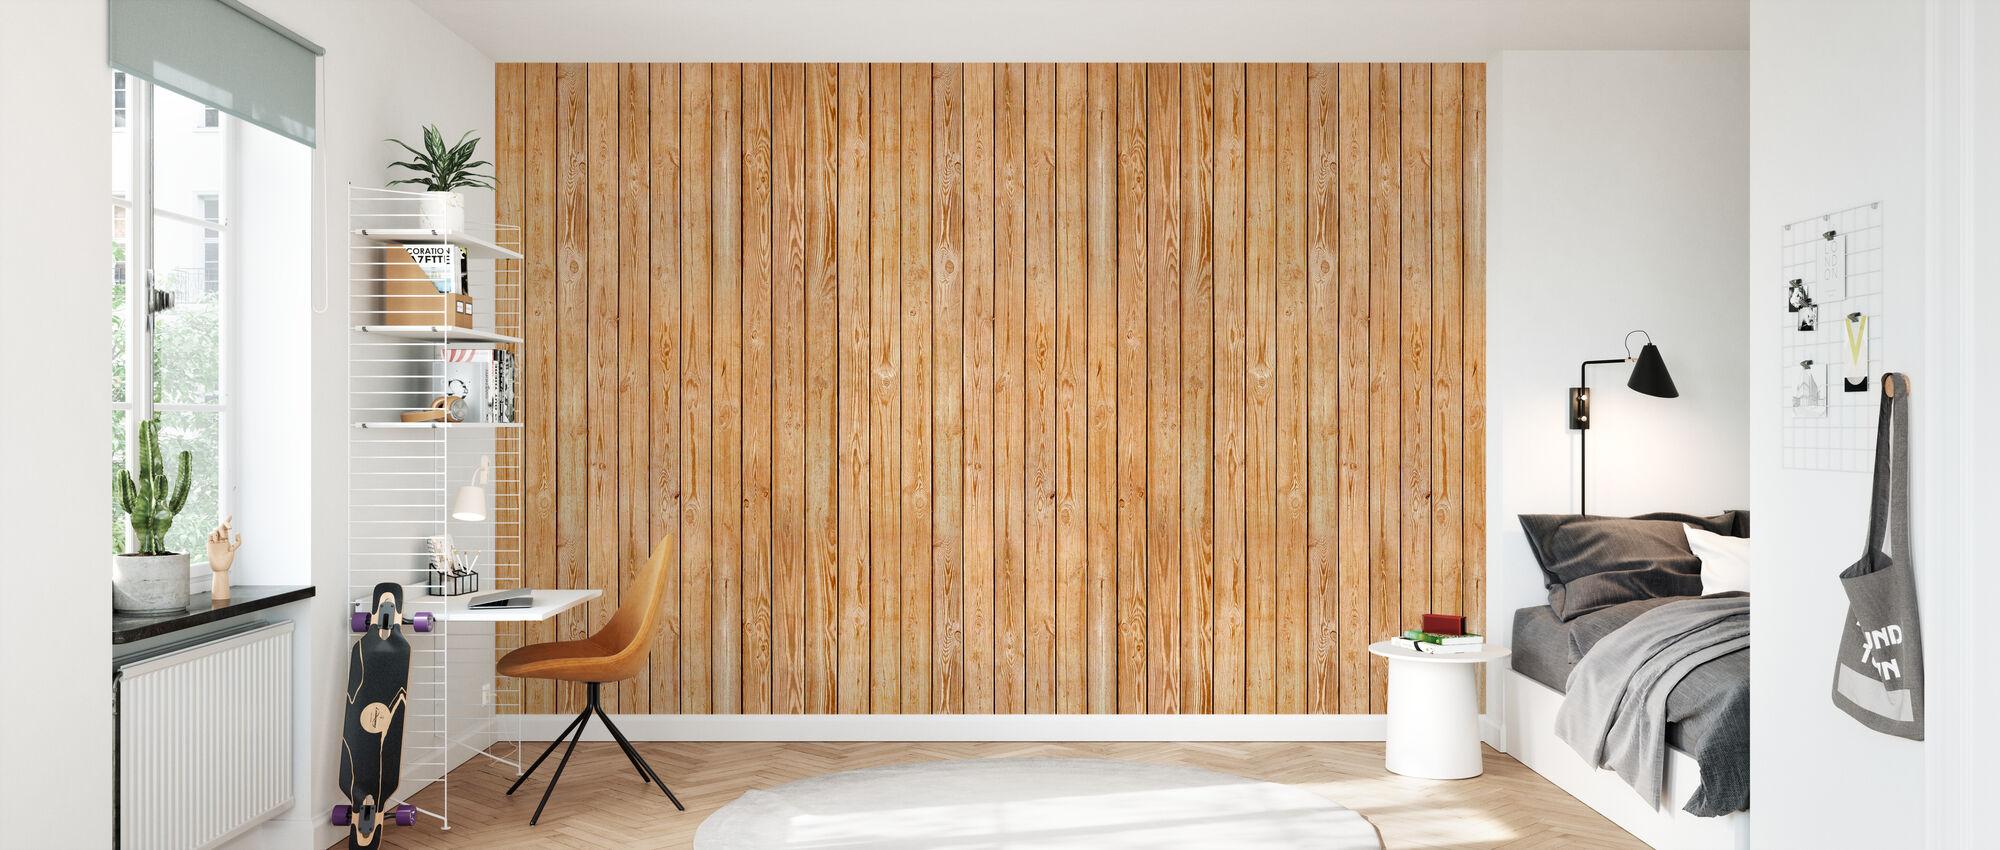 Wooden Plank Wall - Wallpaper - Kids Room